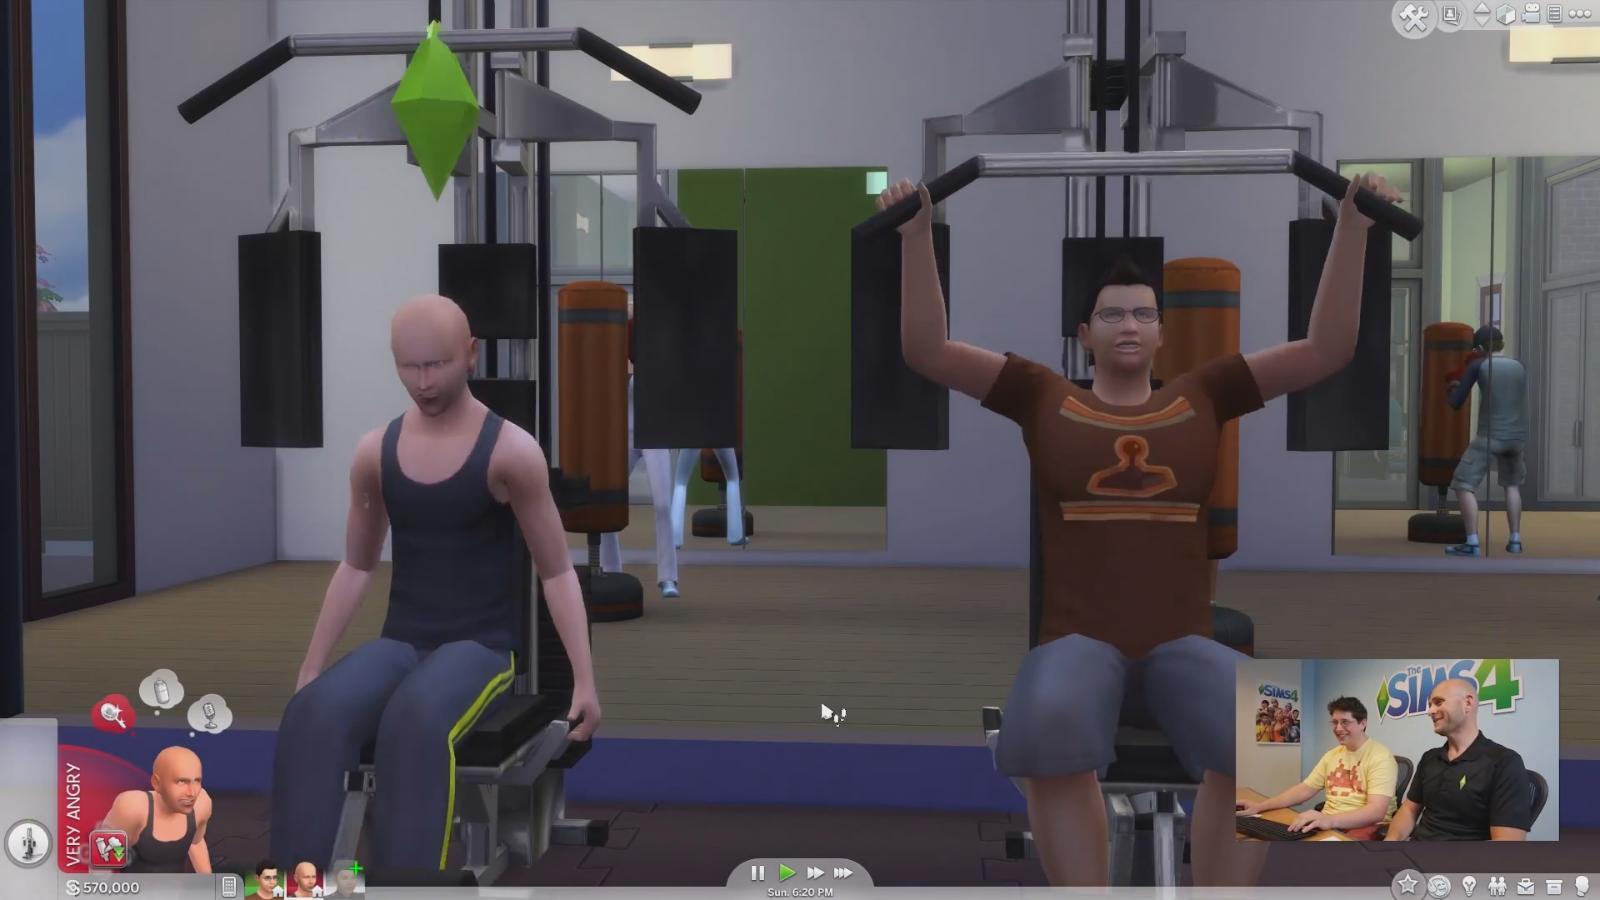 Sims 4 gameplay trailer fitnessstudio 32 for Sims 4 schwangerschaft cheat